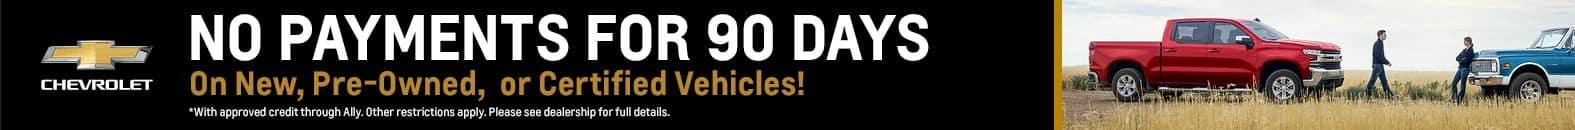 No Payments For 90 Days - Fiesta Chevrolet in Edinburg, Texas